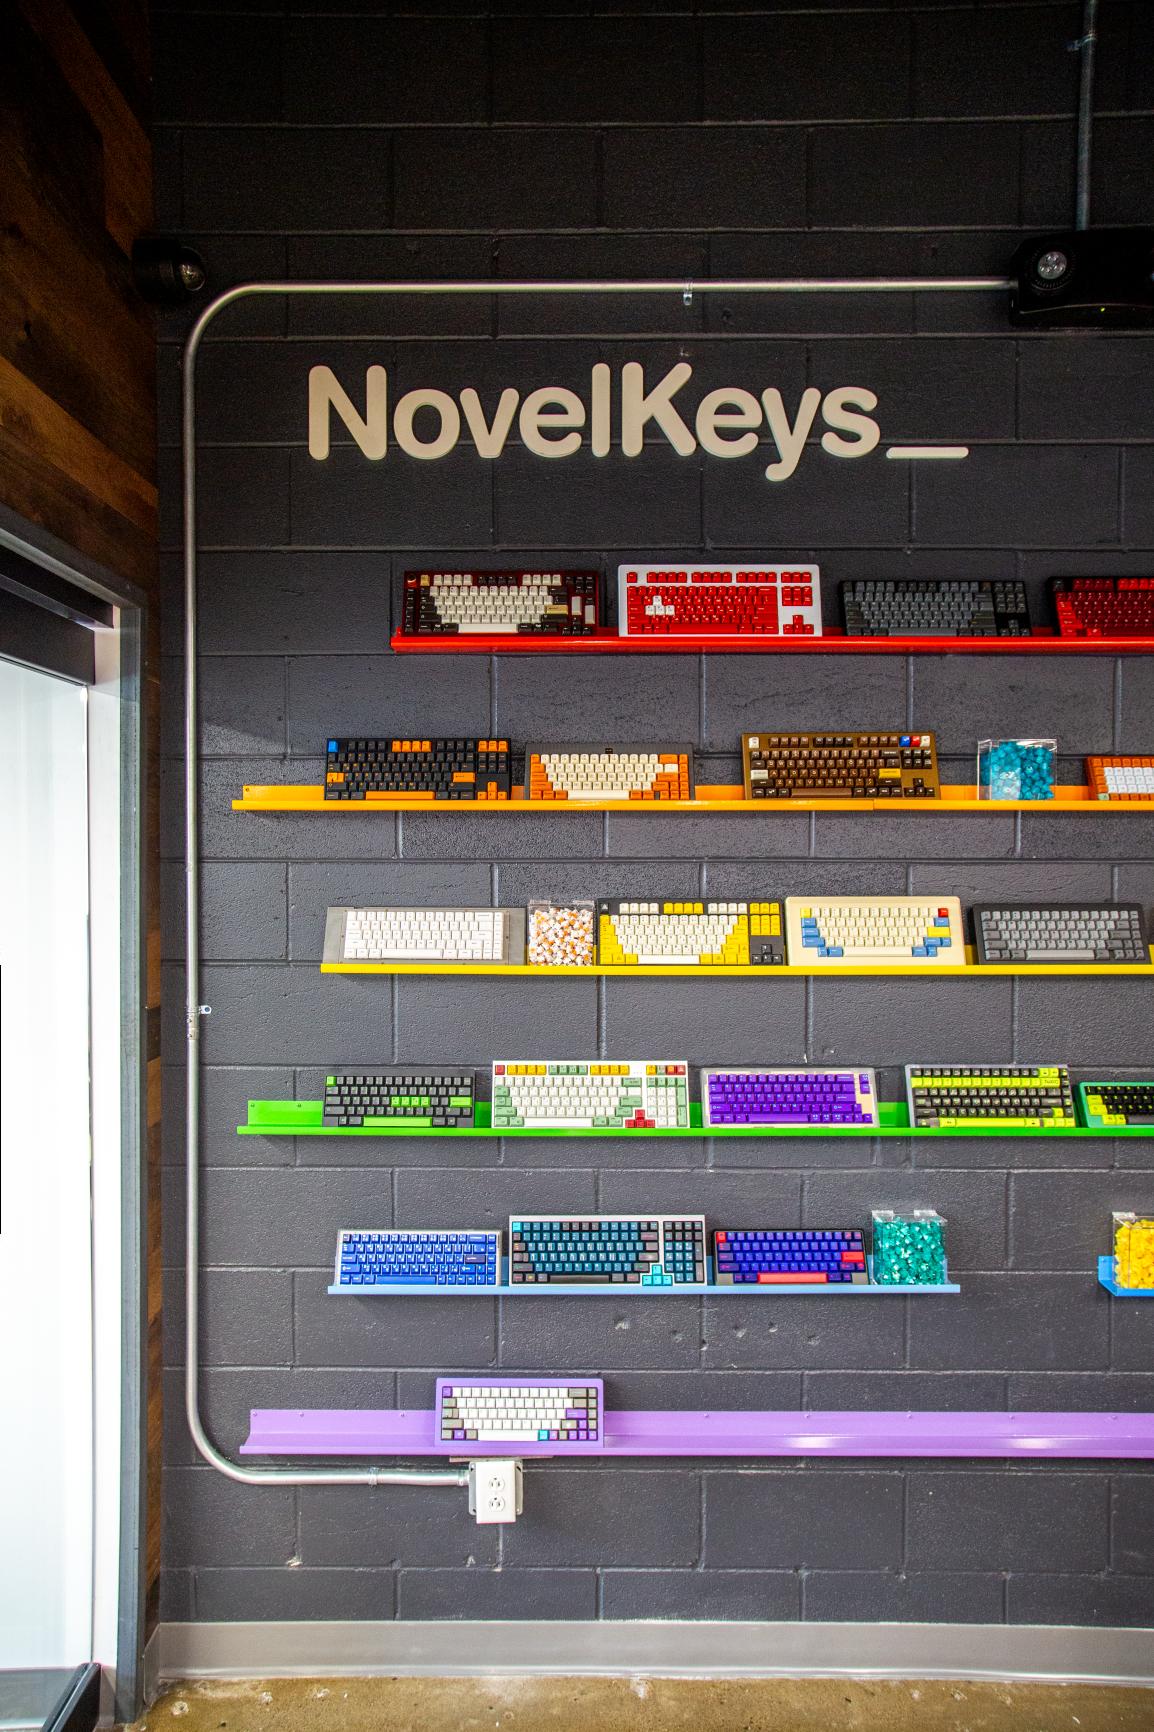 novelkeys keyboard display vertical